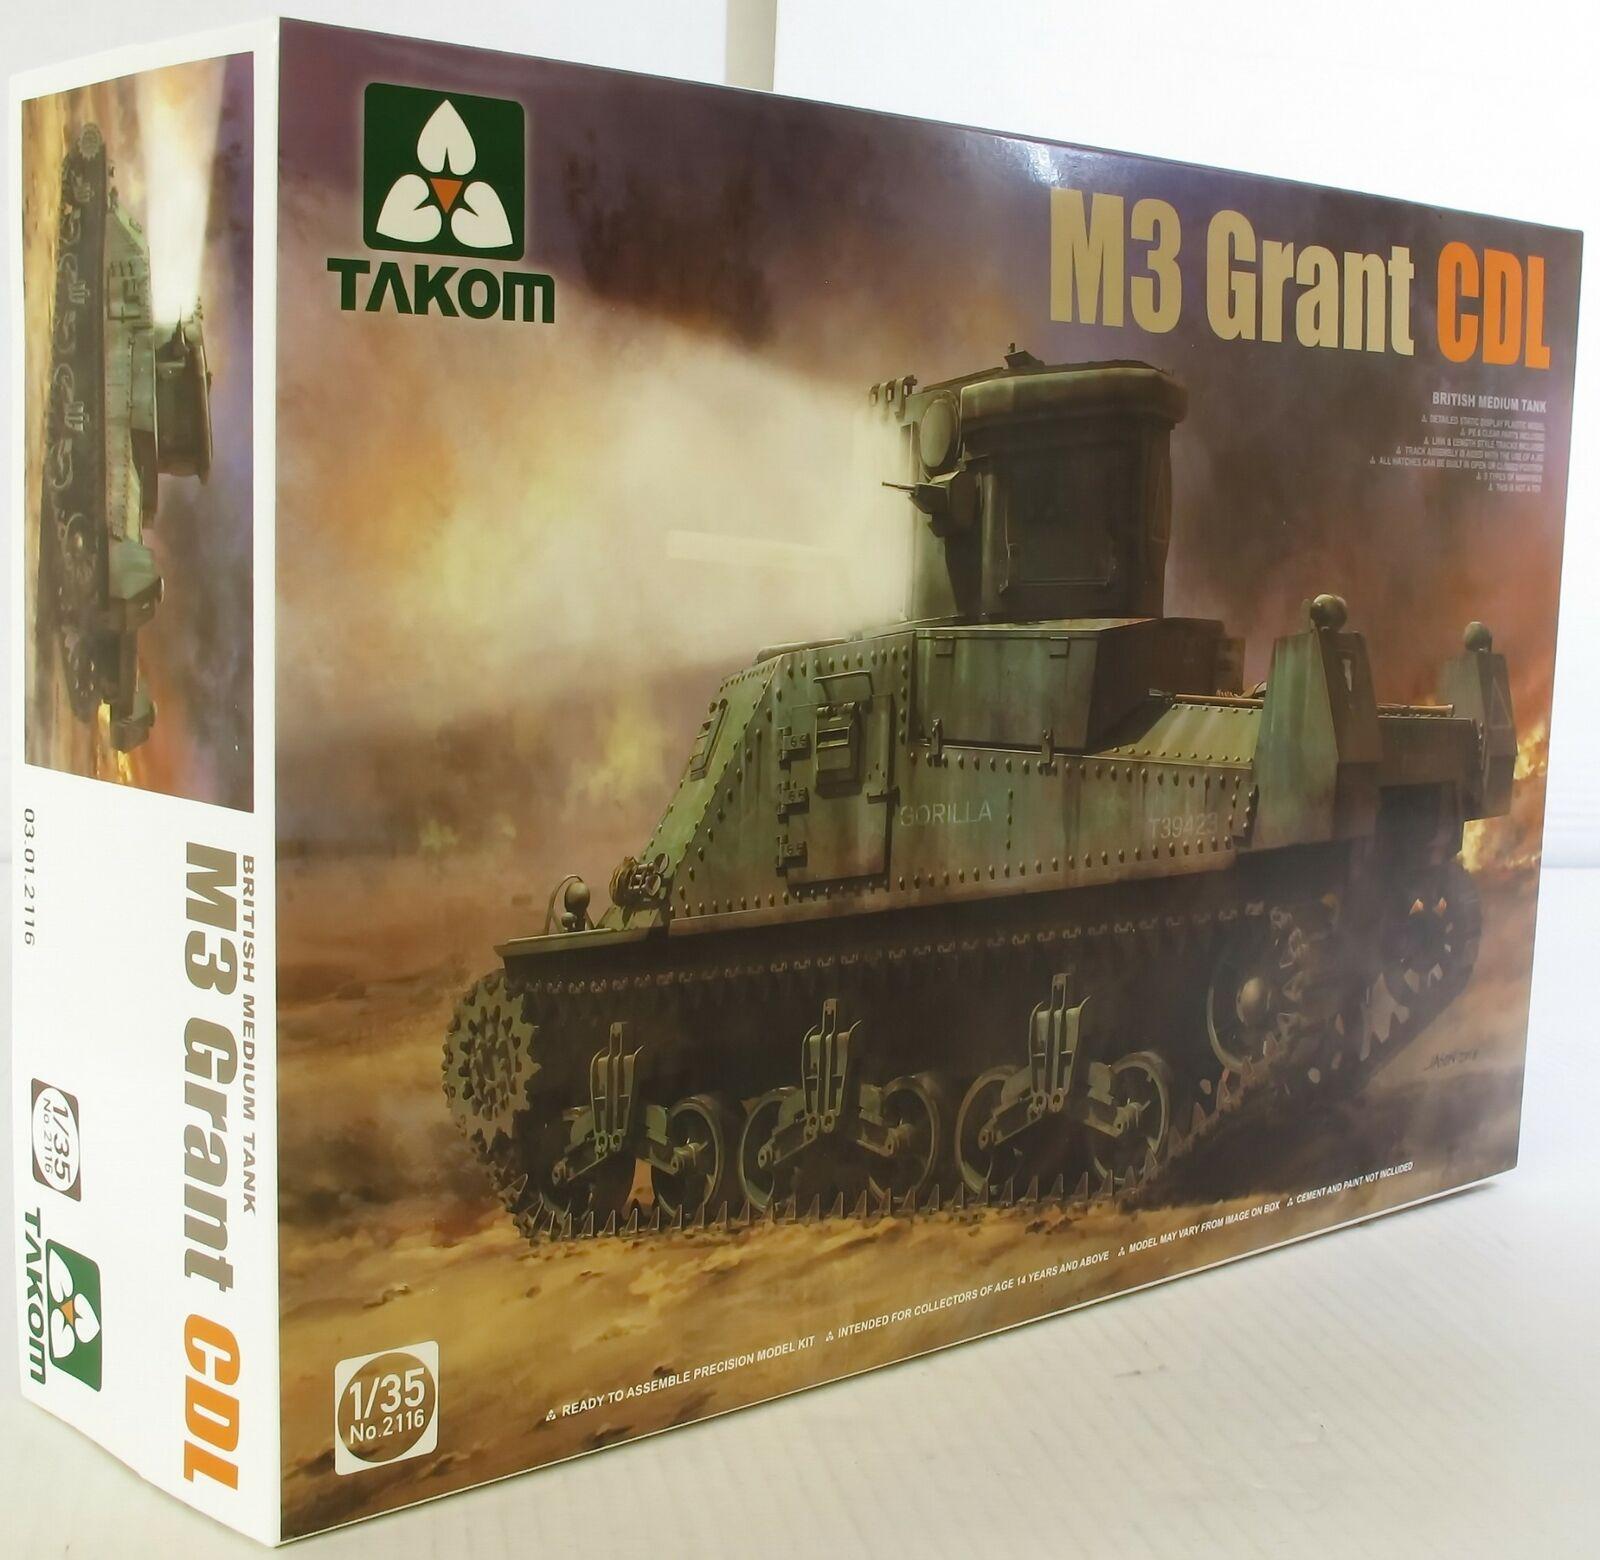 Takom 1 35 02116 M3 Grant CDL British Medium Tank Model Military Kit